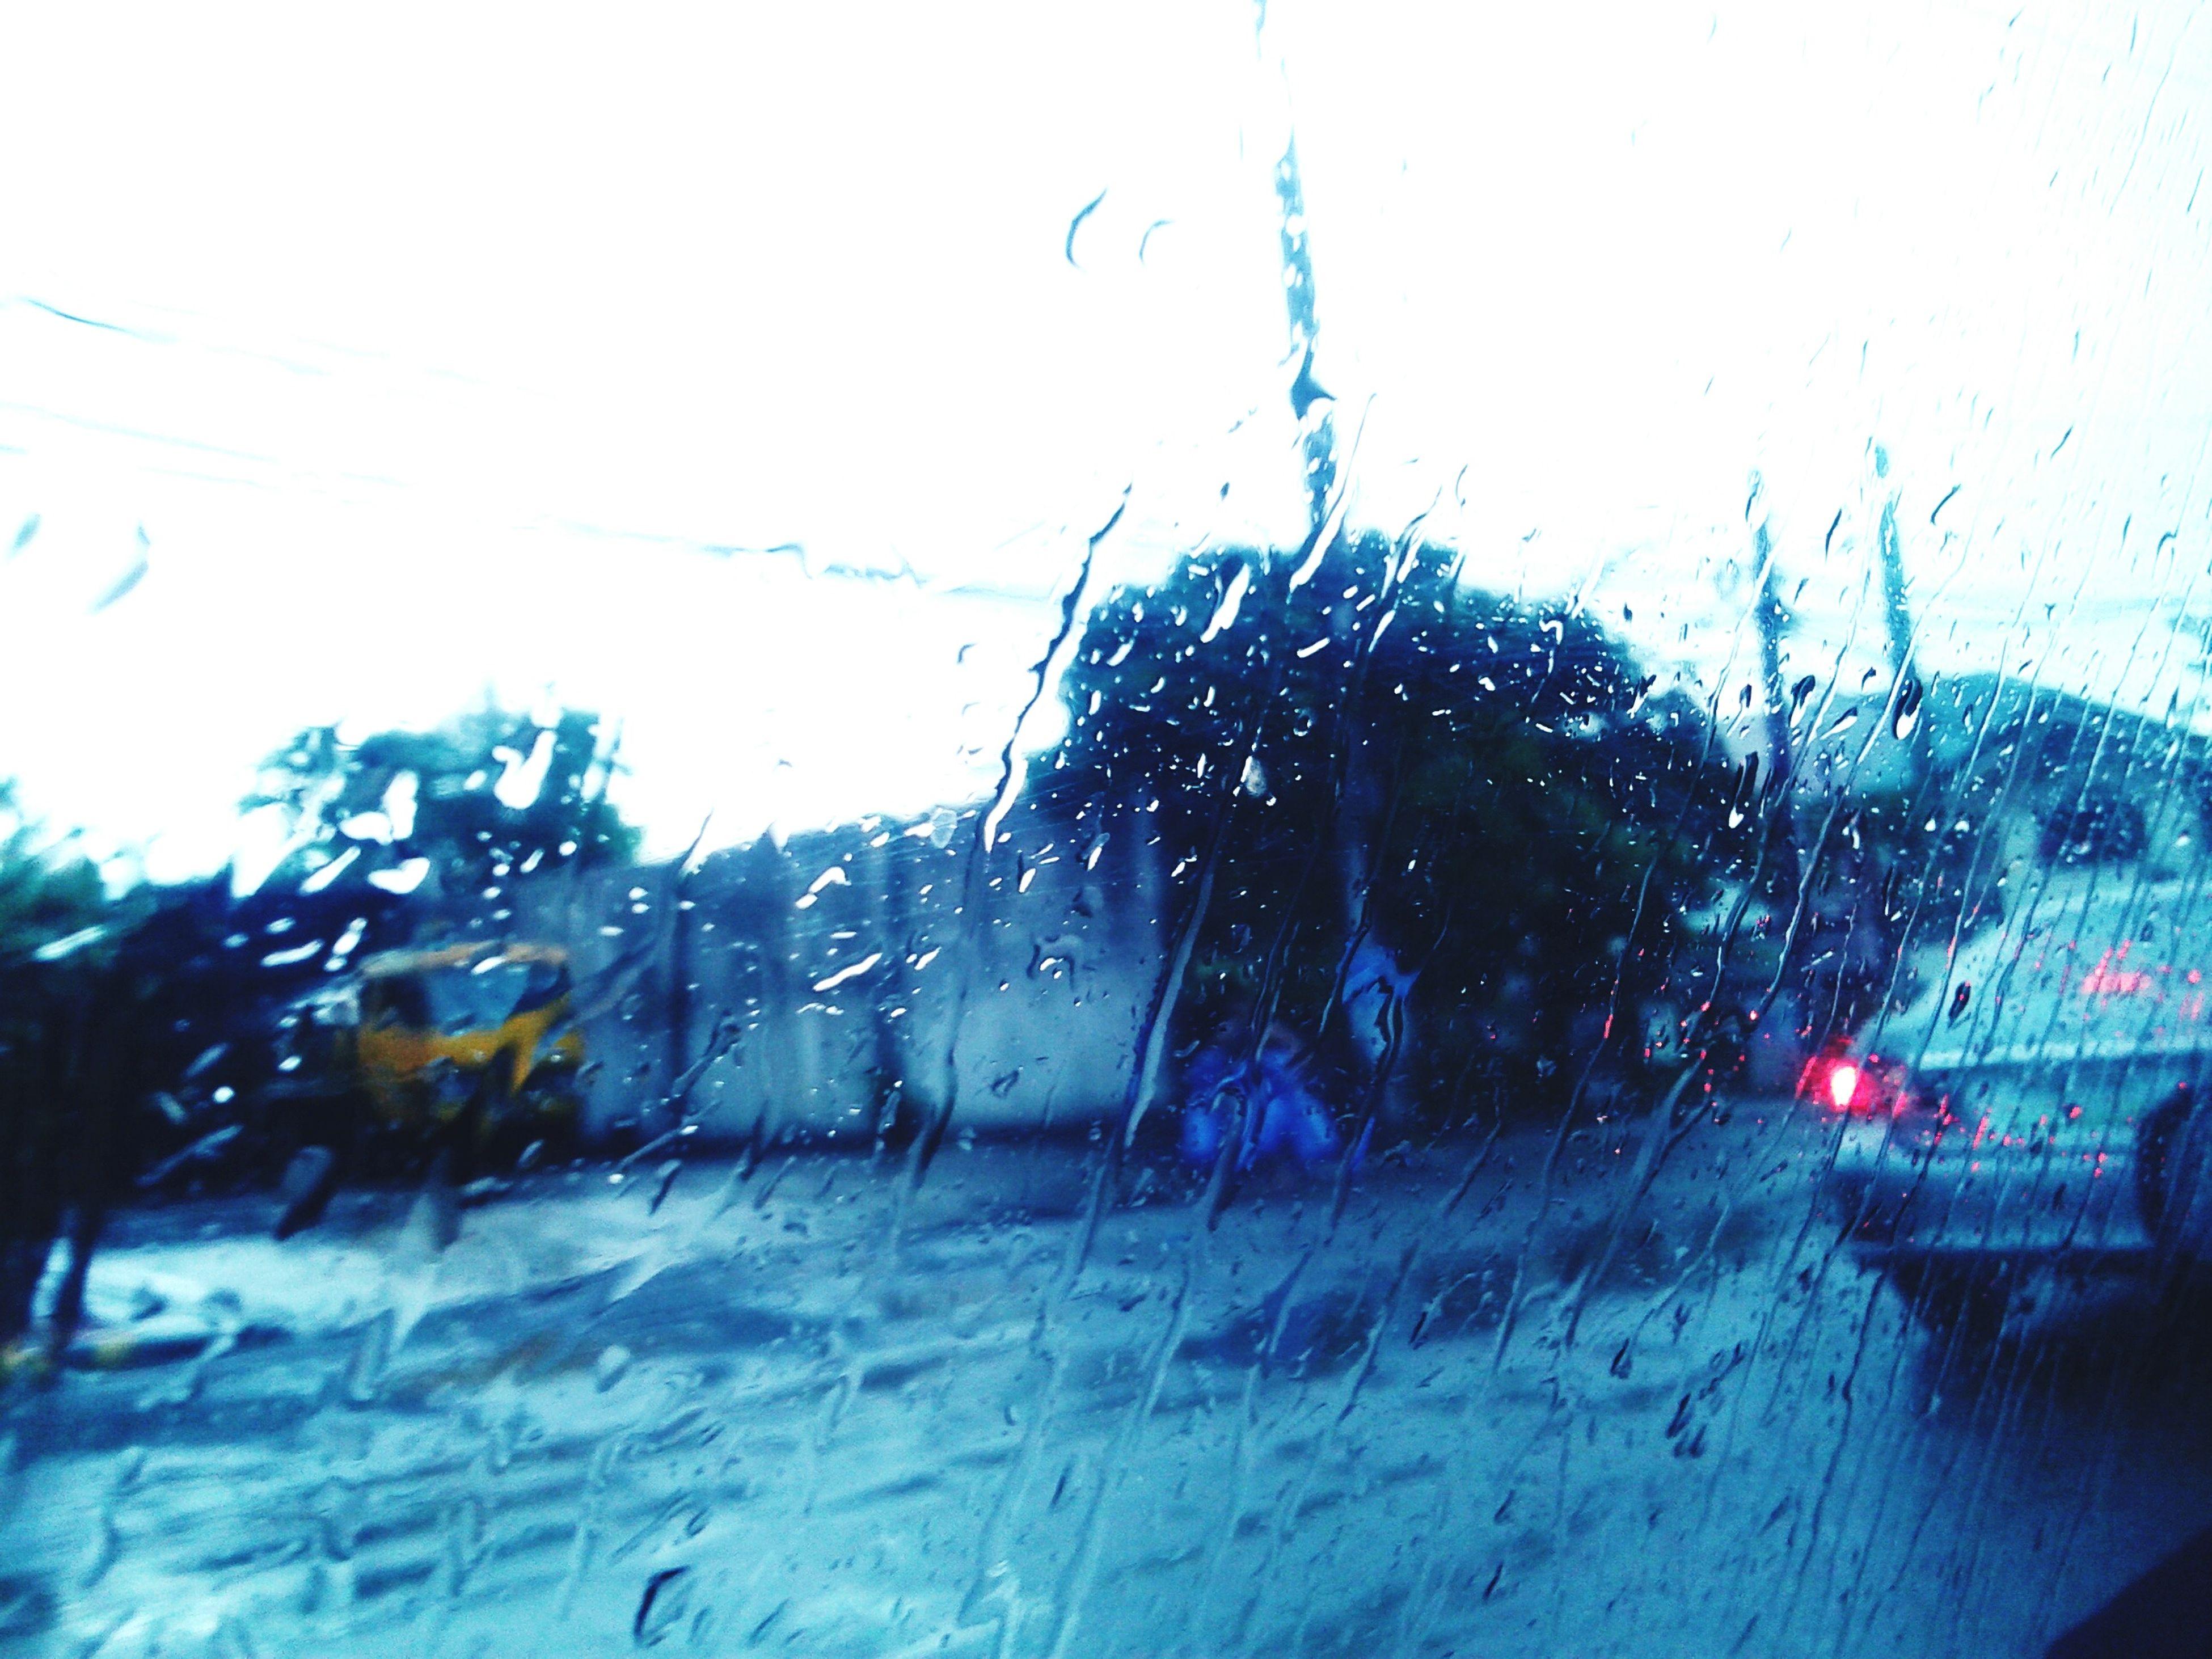 wet, drop, car, land vehicle, rain, window, transparent, season, transportation, glass - material, weather, mode of transport, raindrop, street, water, vehicle interior, windshield, monsoon, road, indoors